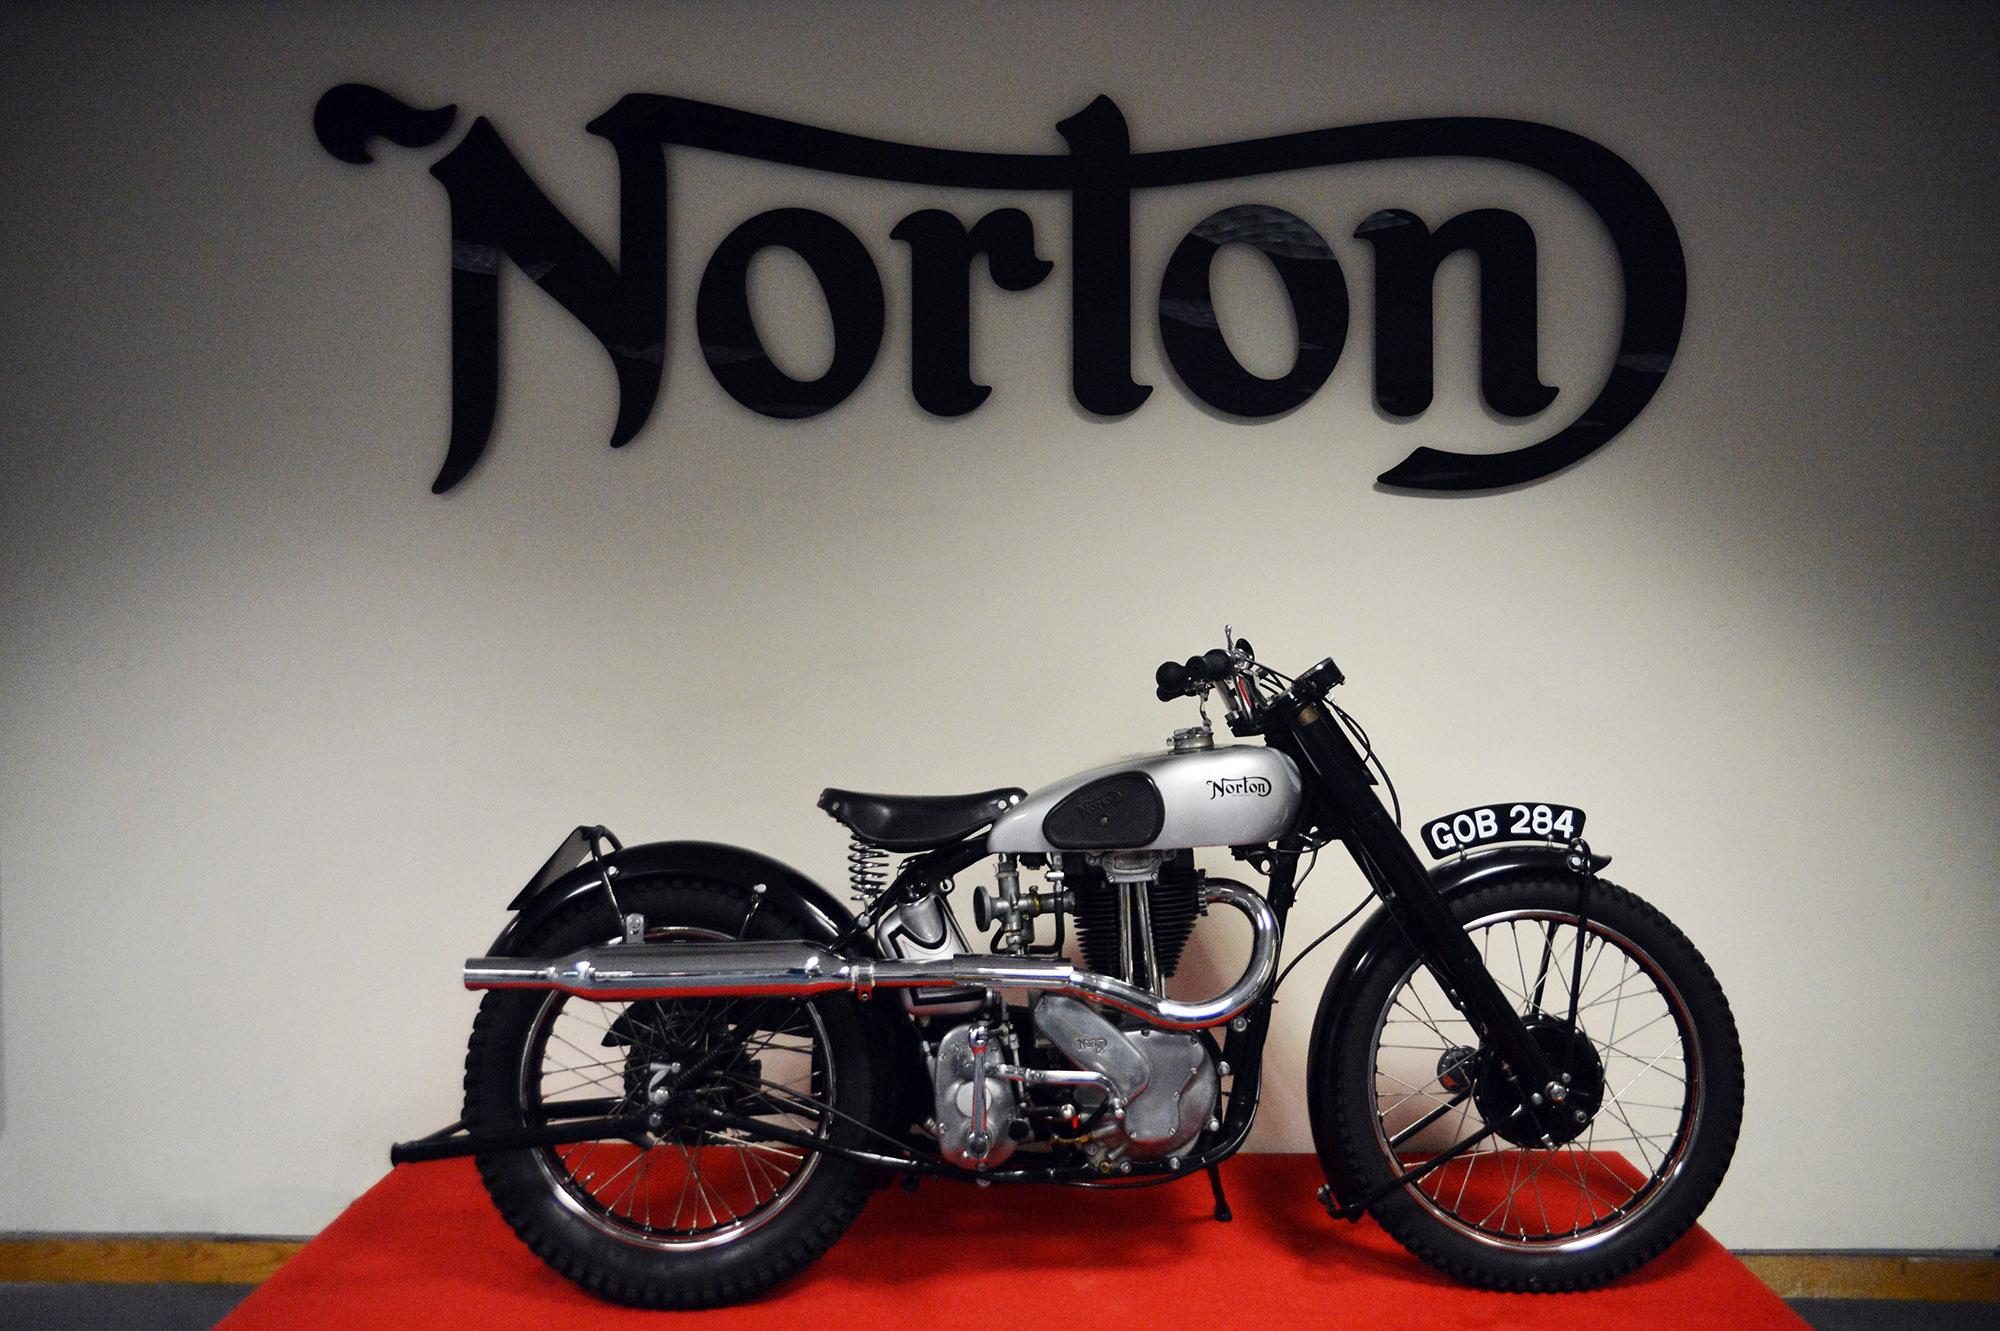 A historic Norton